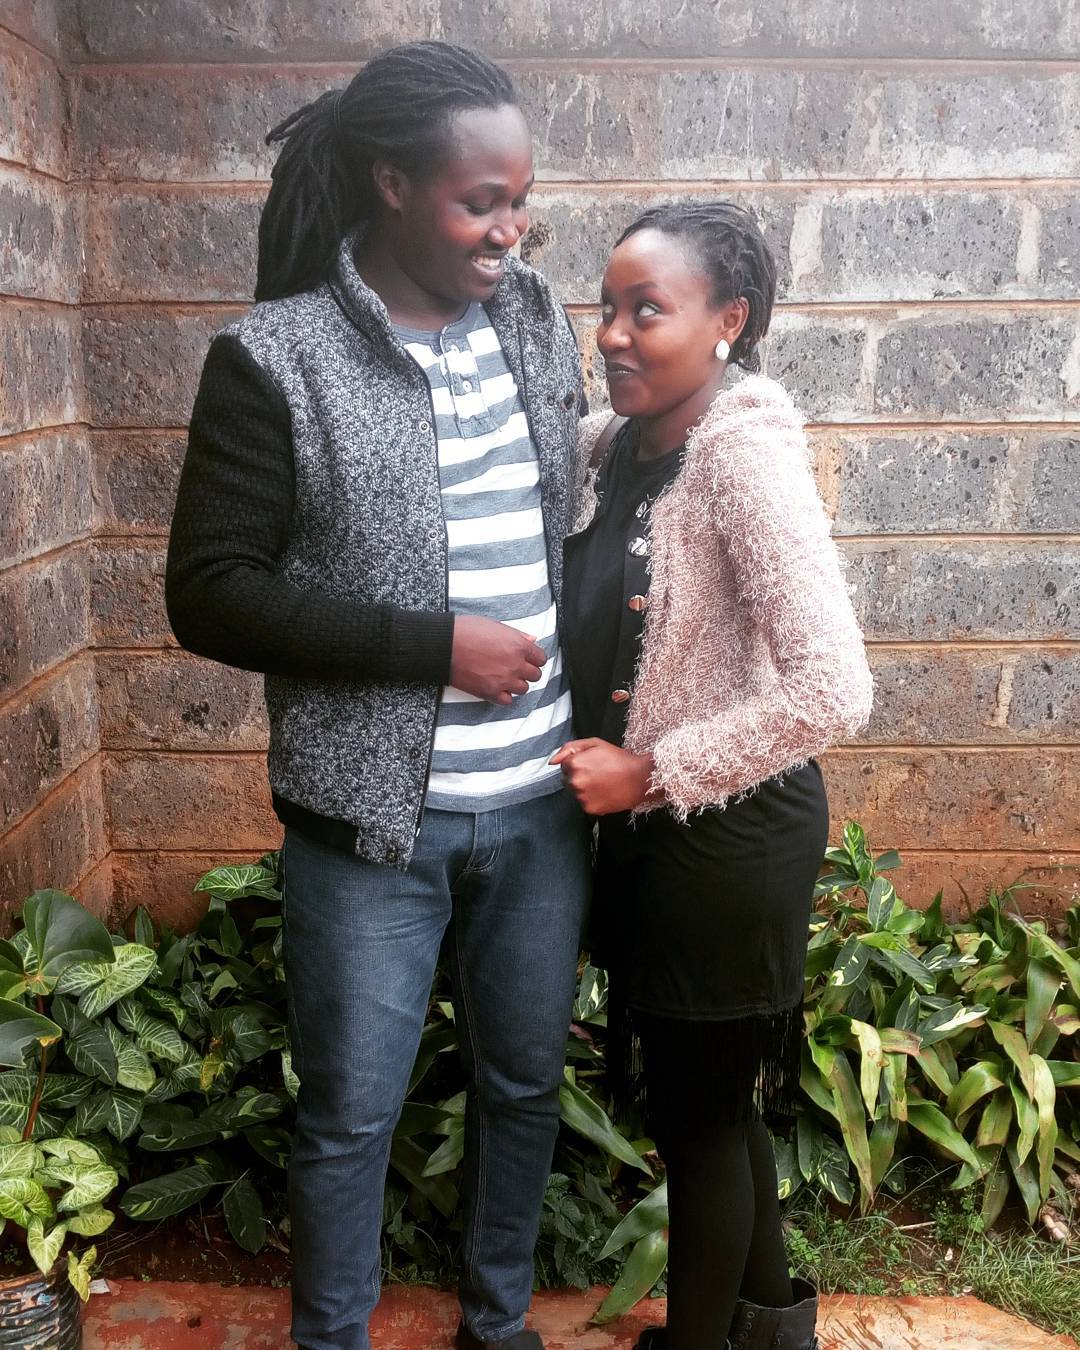 Titus Wagithomo and Nyce Wanjeri